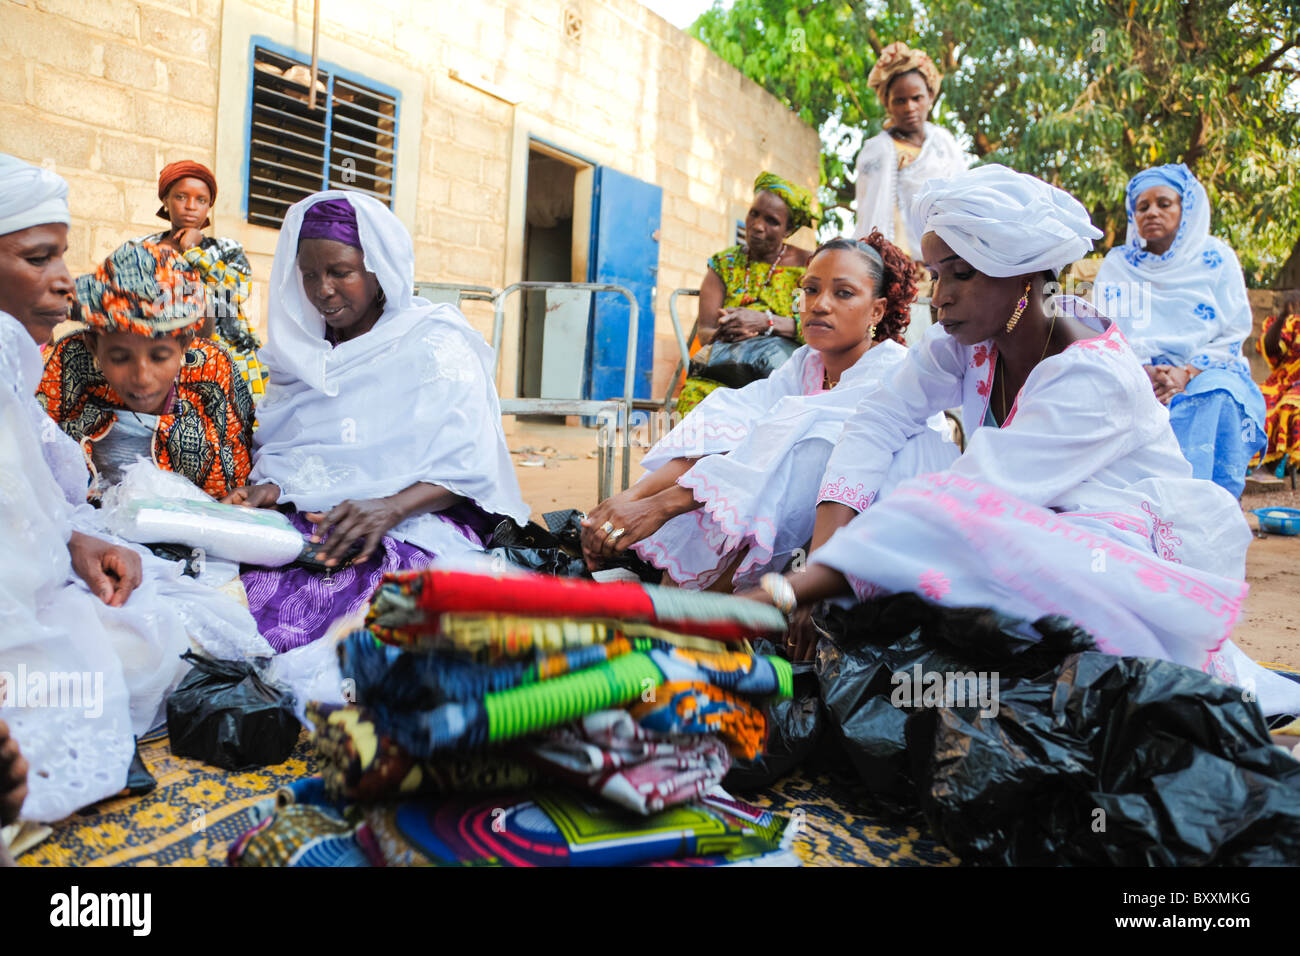 In Ouagadougou, Burkina Faso, women bring gifts of clothing to a child's baptism. - Stock Image